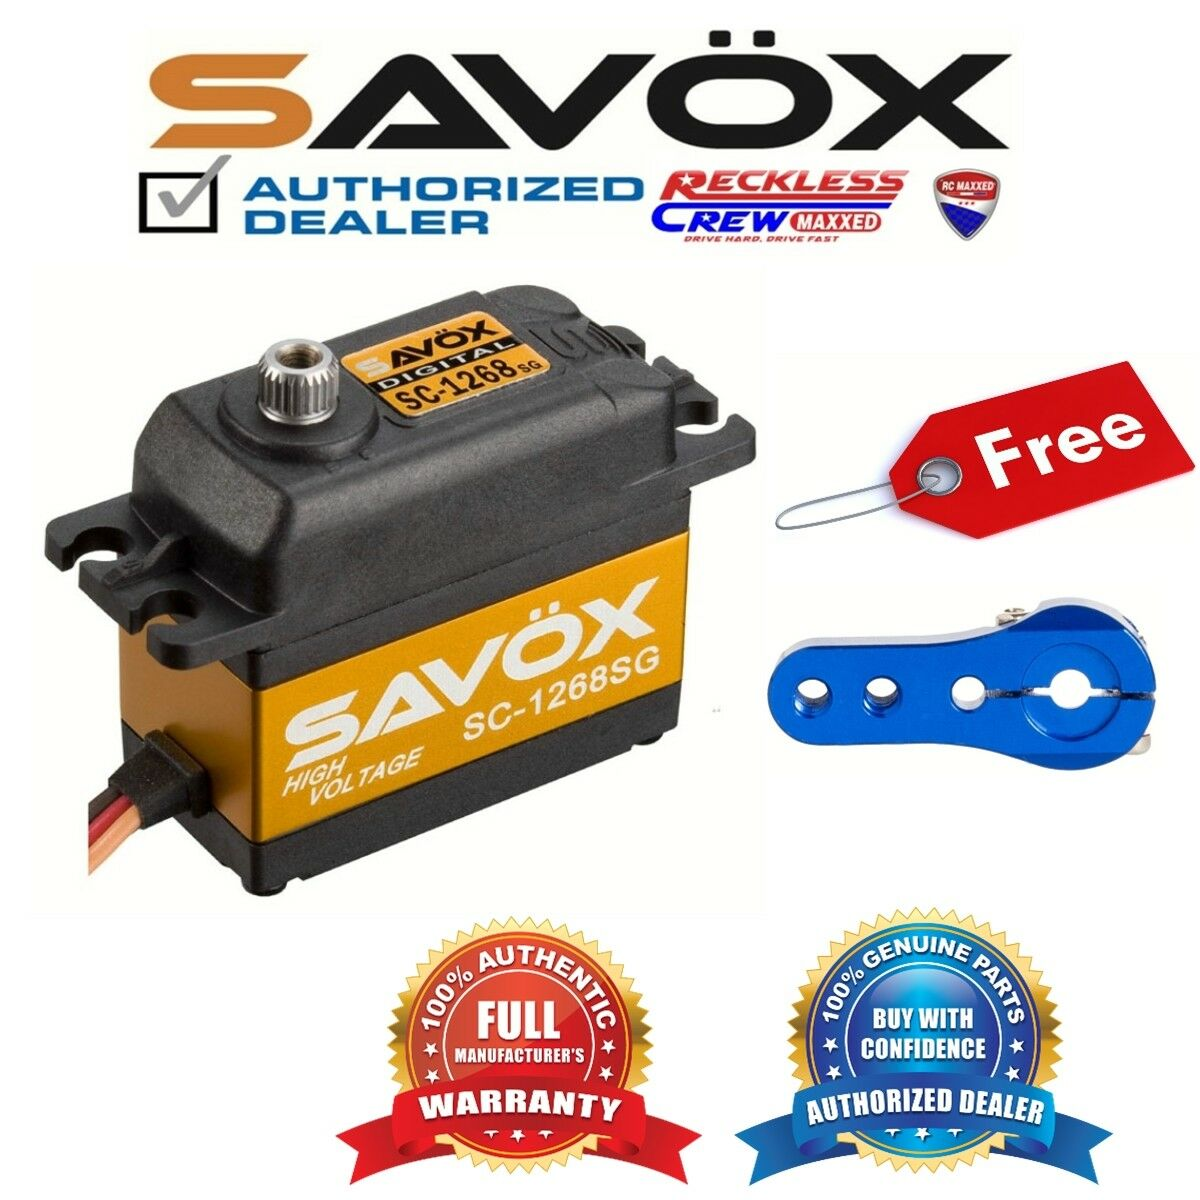 Savox SC-1268SG alto esfuerzo de torsión Digital Servo + Gratis Aluminio Servo Horn Azul